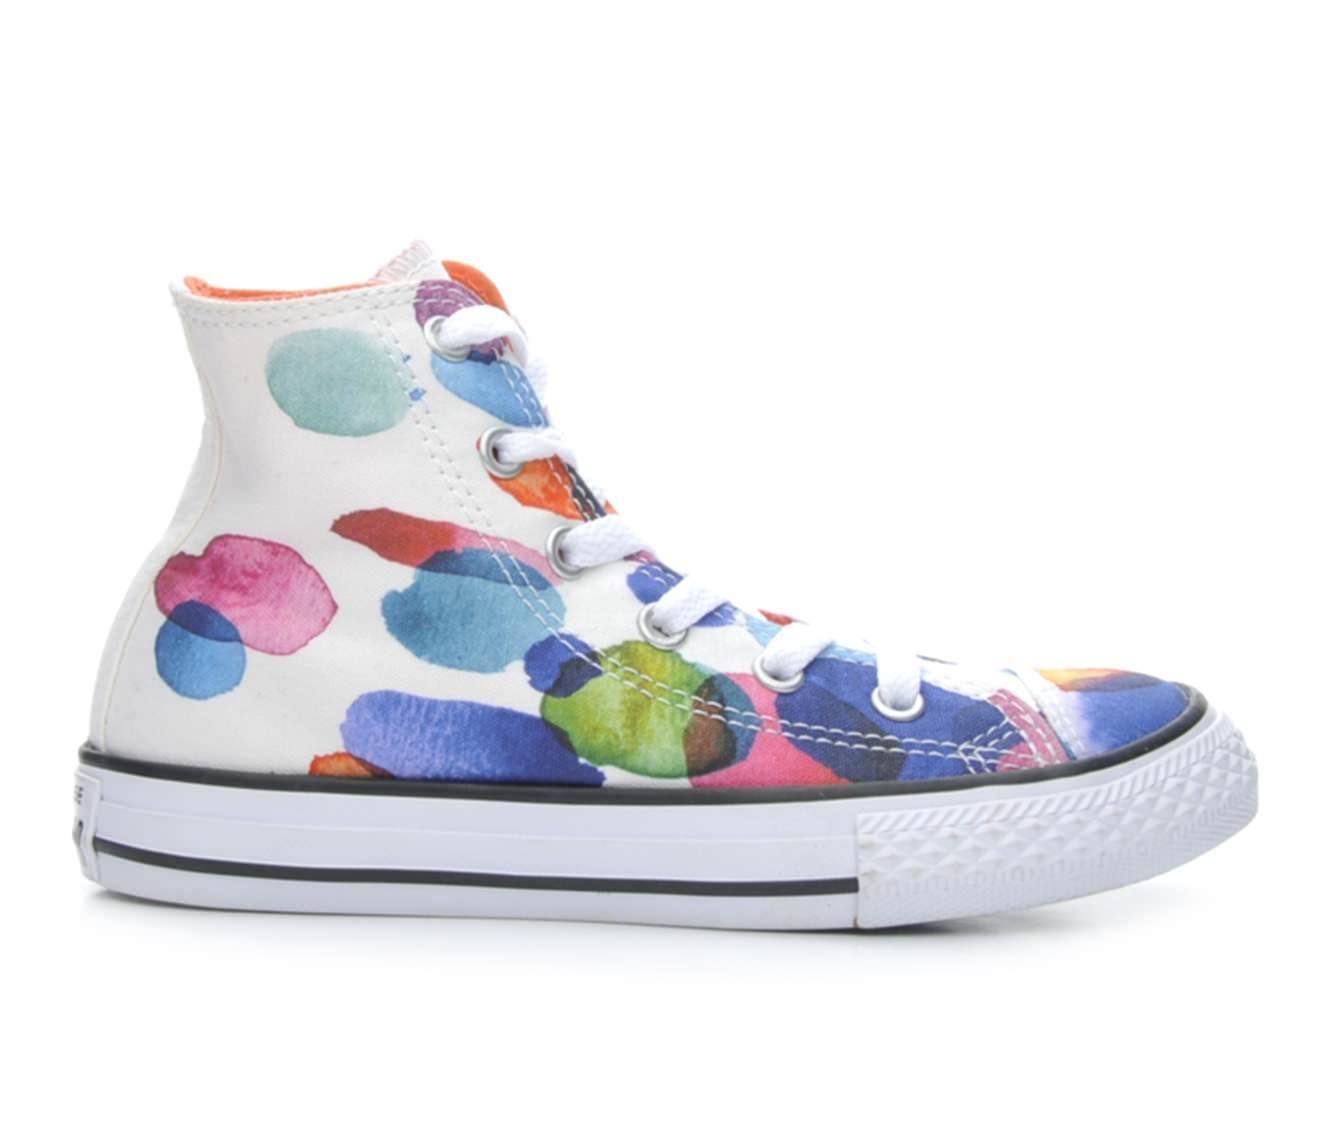 Girls' Converse Chuck Taylor All Star Hi Sneakers (Multicolor)